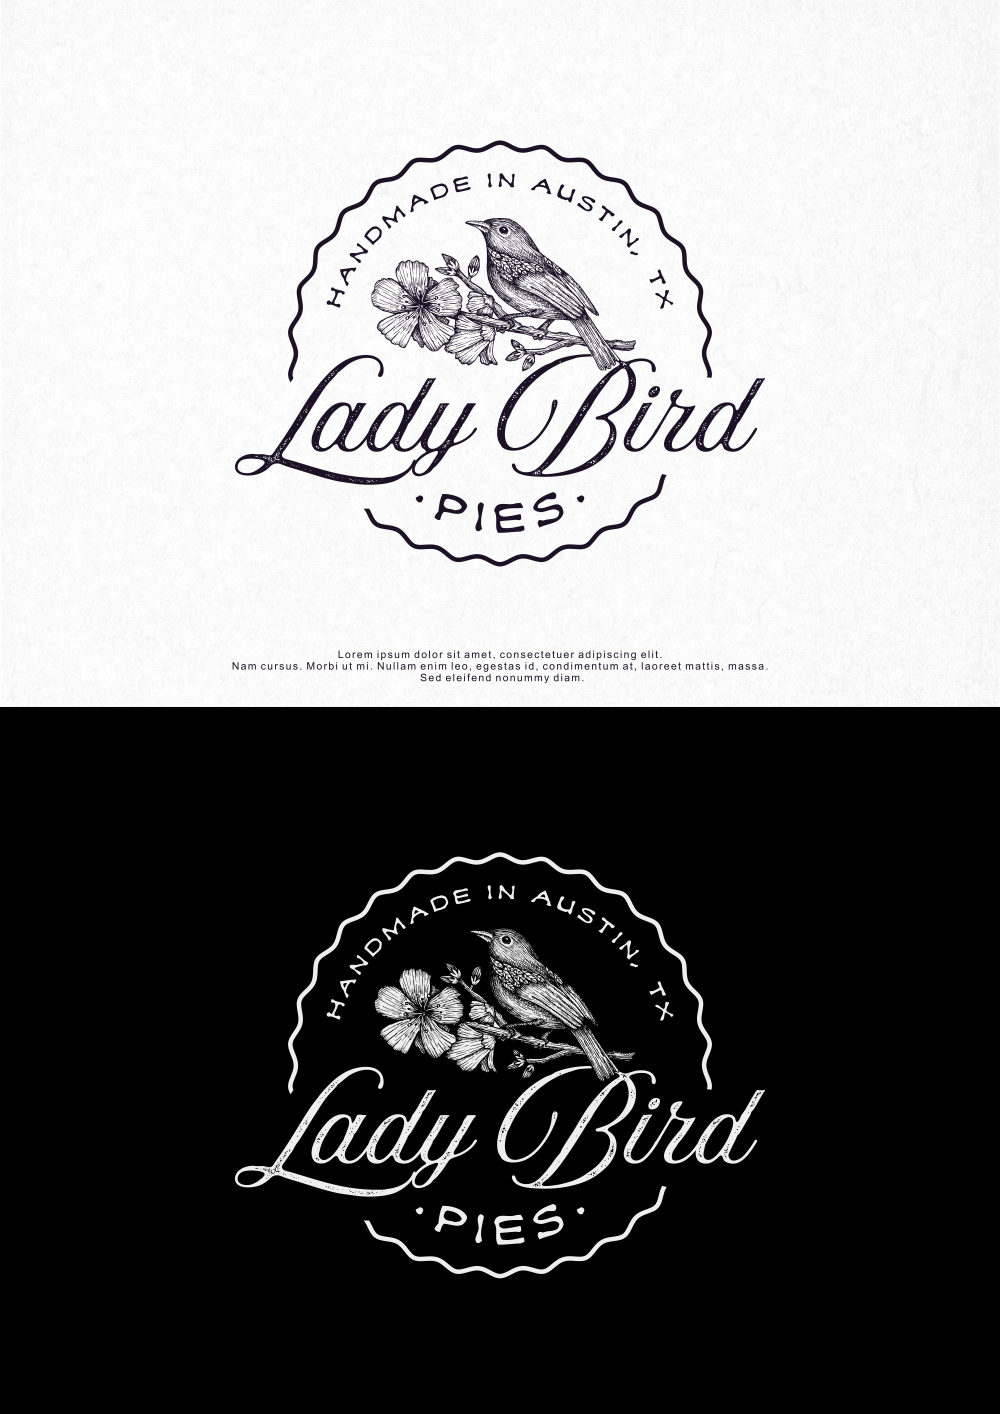 Lady Bird Pies logo